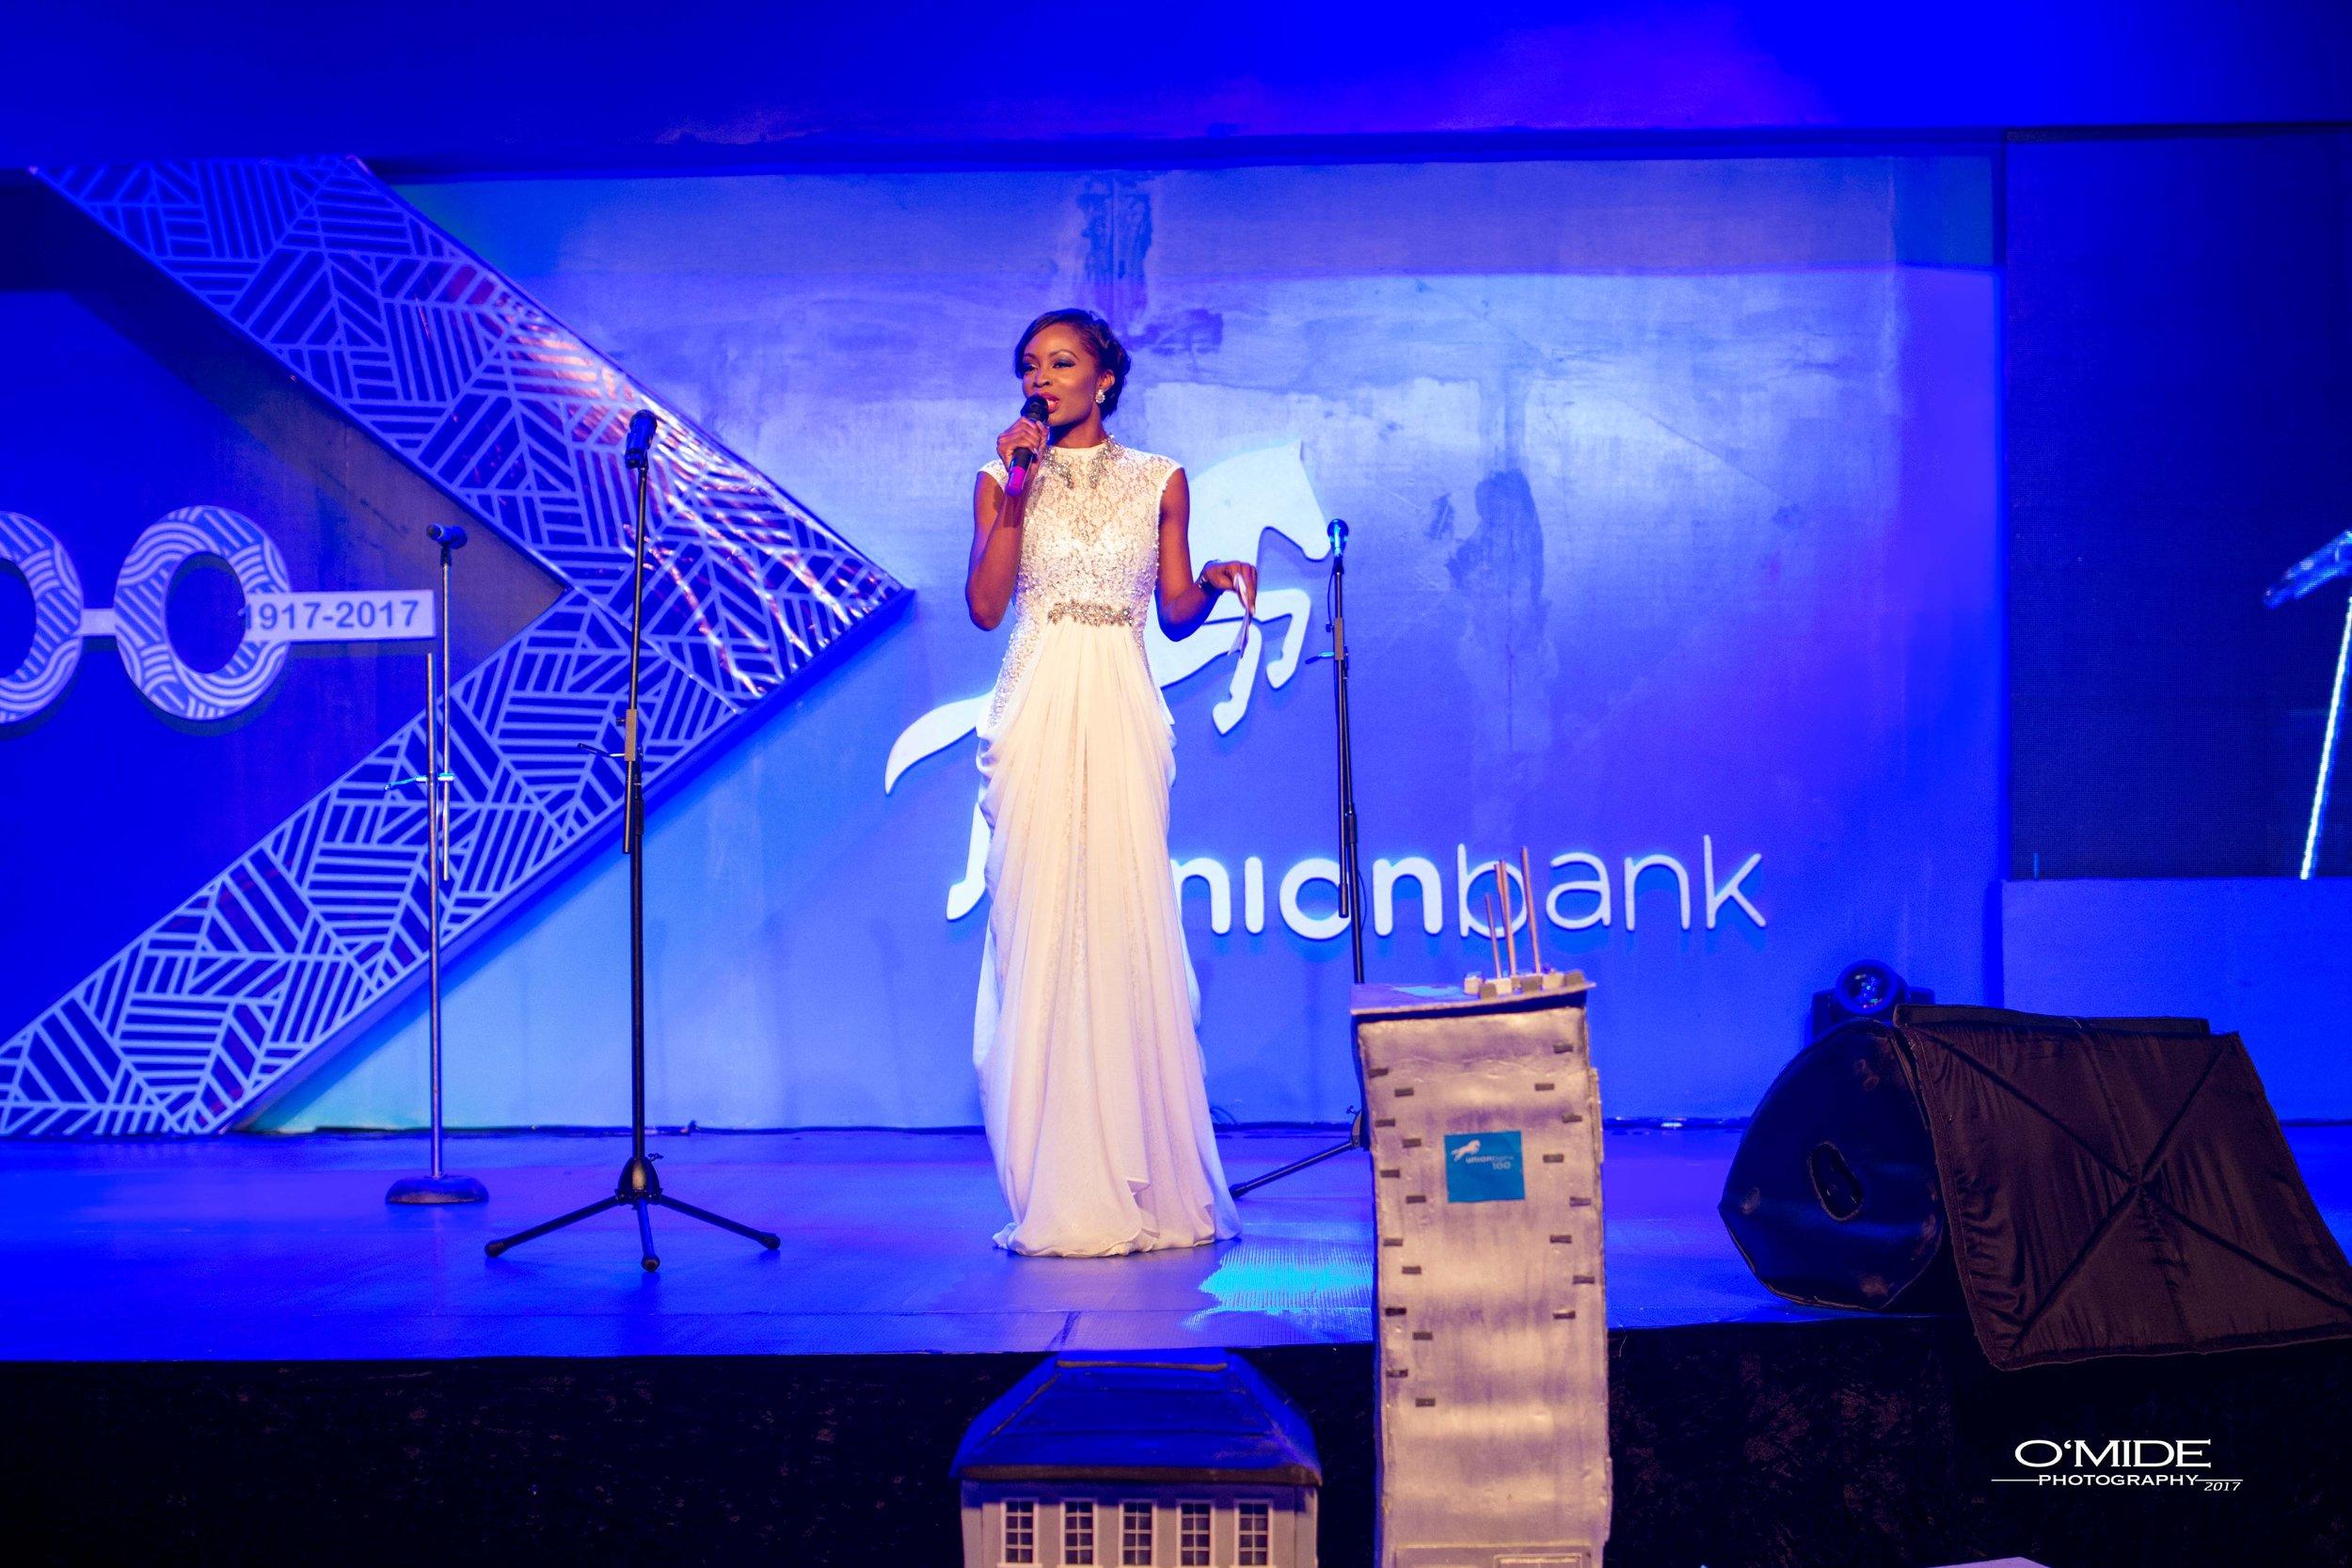 Hosting the Union Bank Centenary Celebration